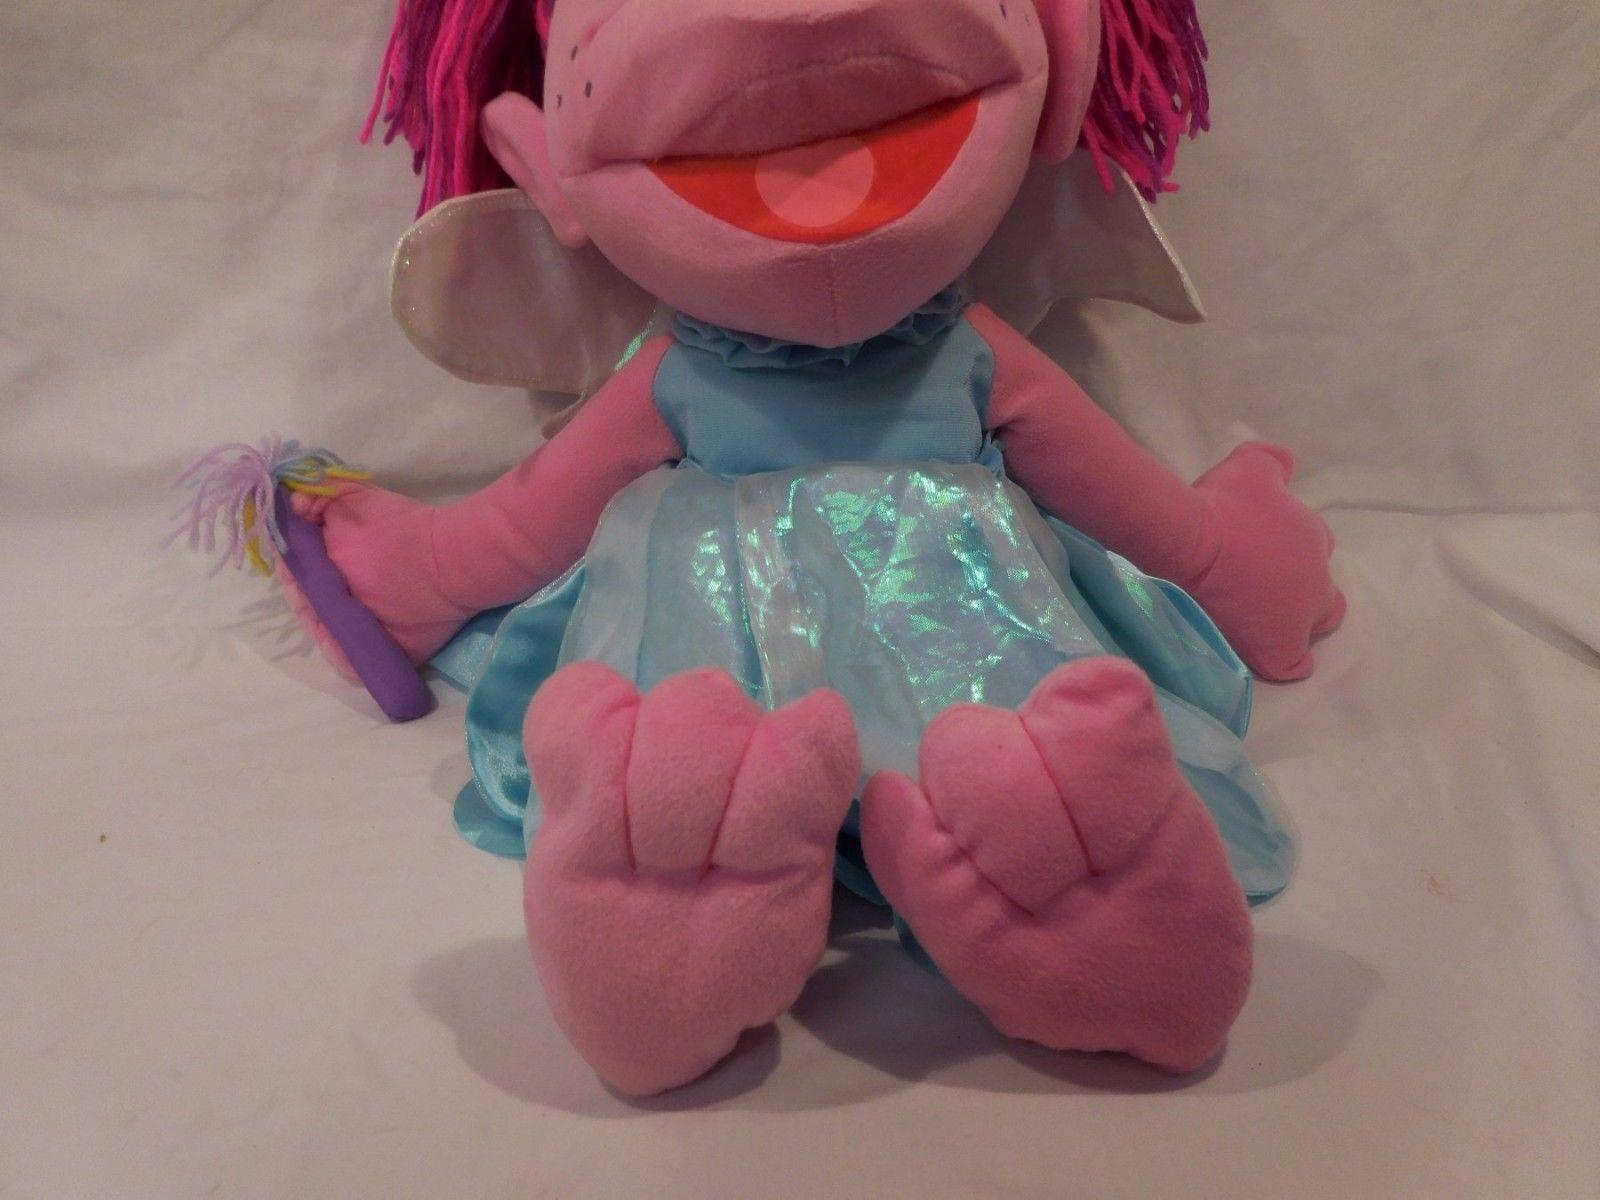 Muppets Abby Cadabby 21